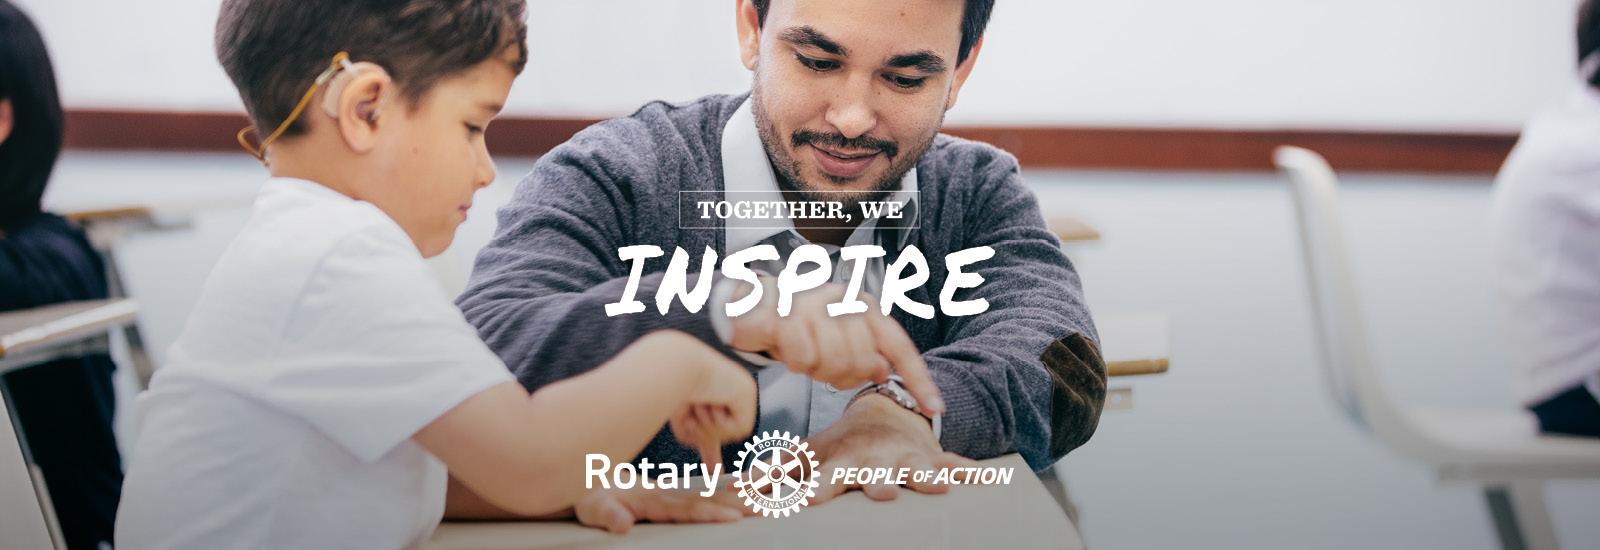 Together, We Inspire